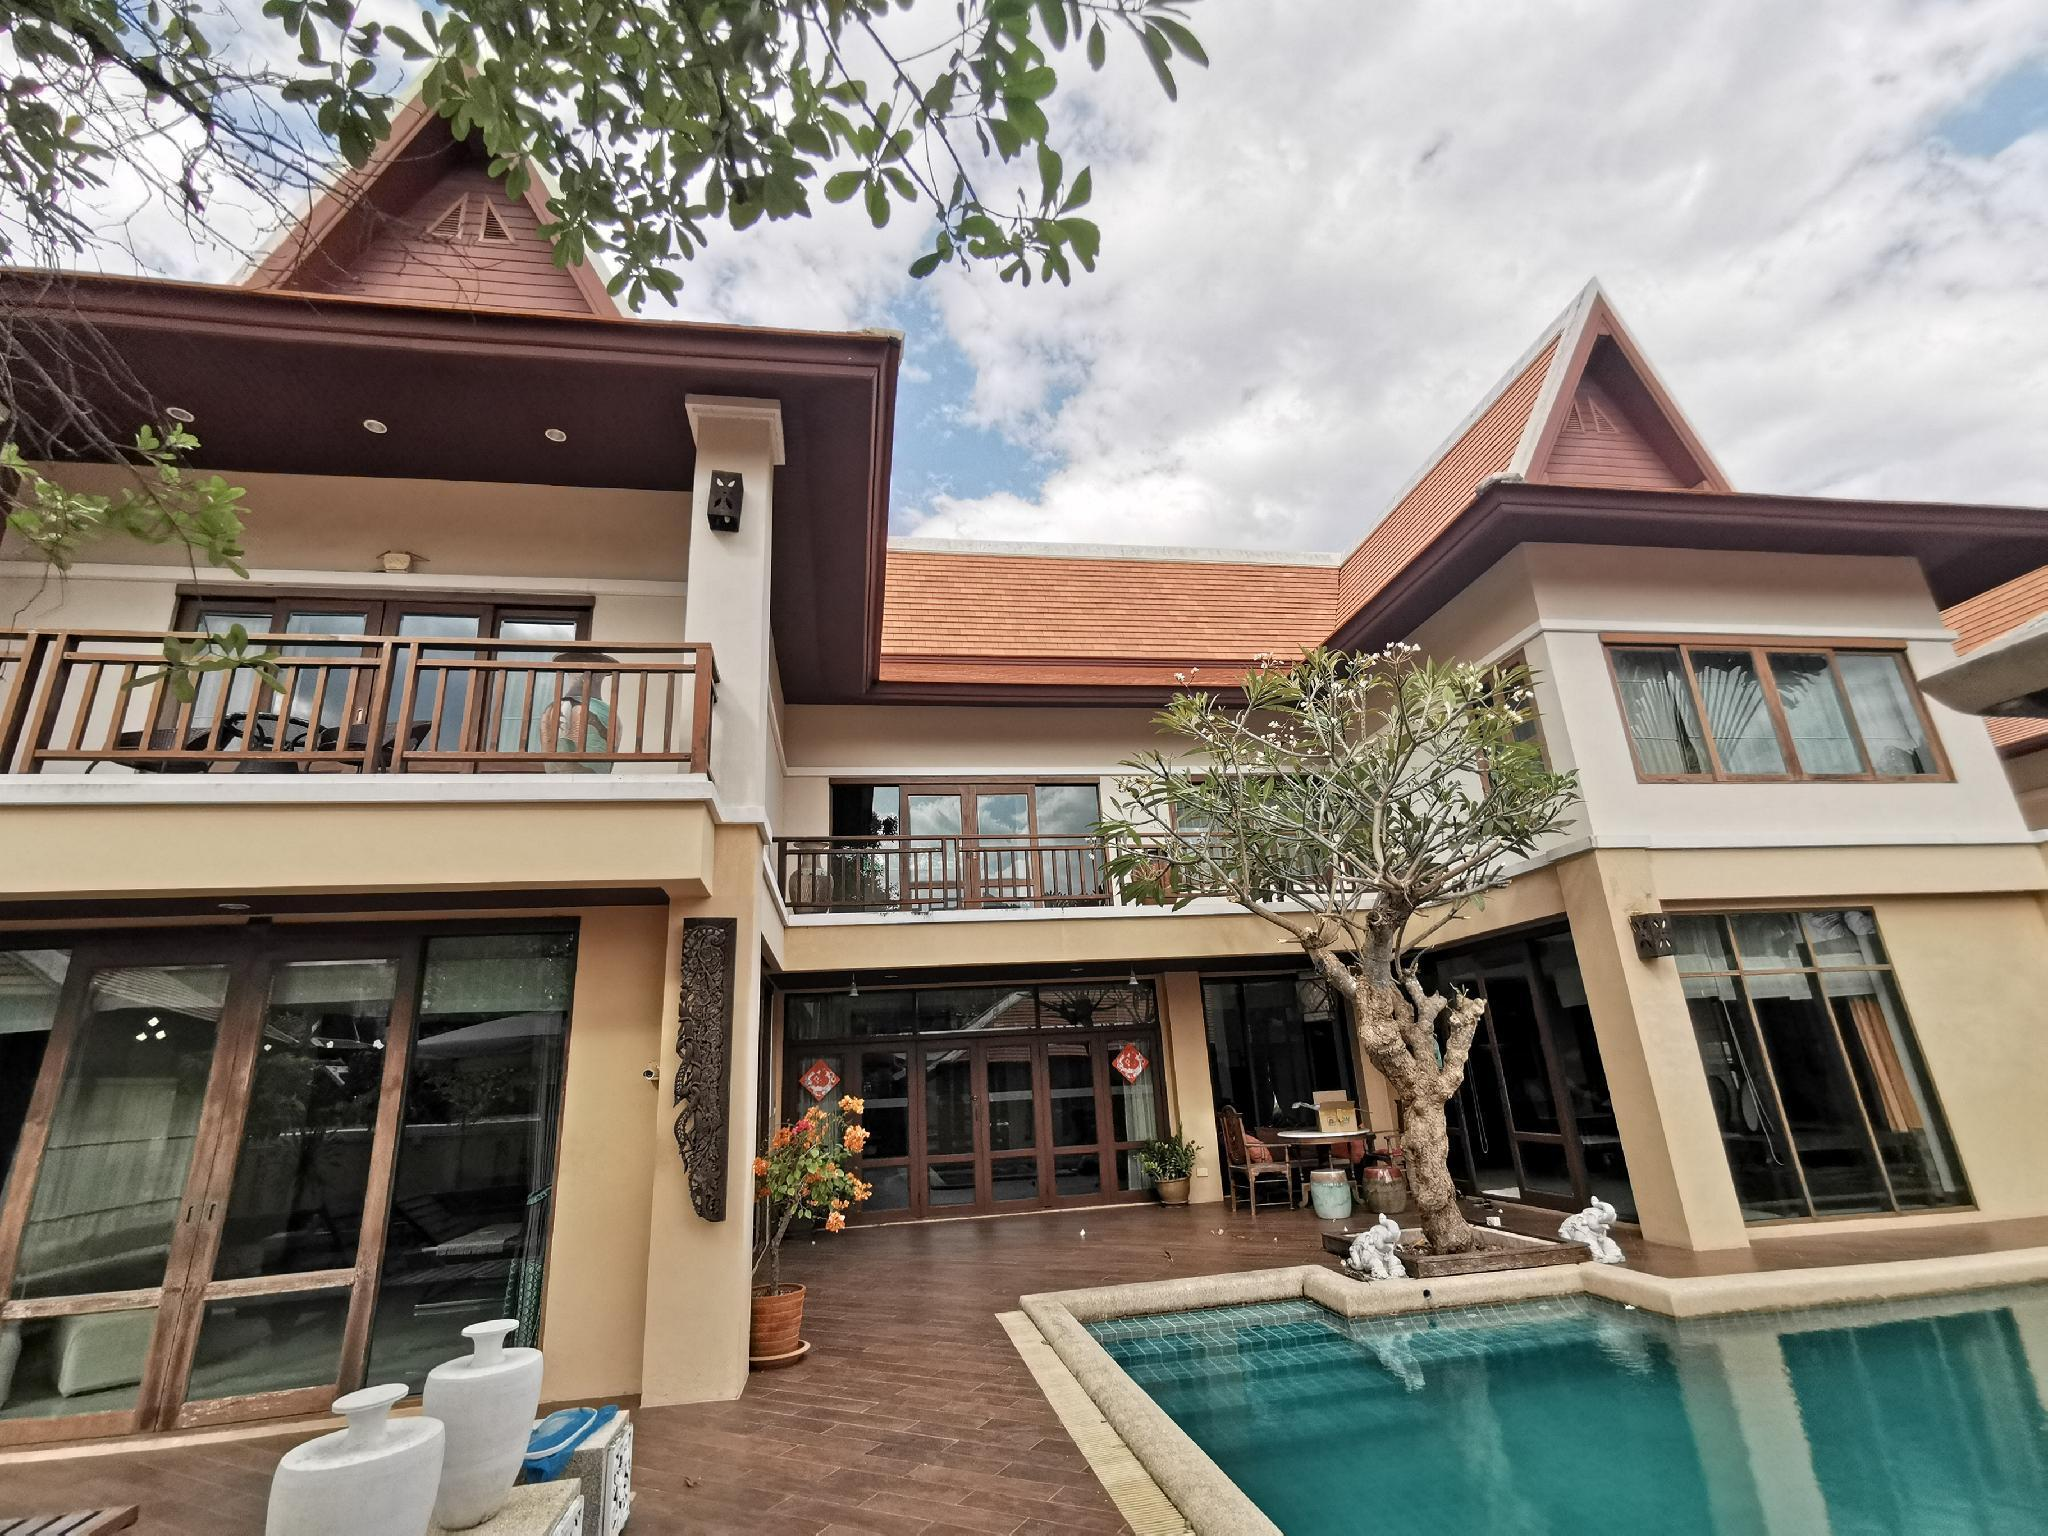 Luxury pool villa/5bedrooms/free motor use วิลลา 5 ห้องนอน 5 ห้องน้ำส่วนตัว ขนาด 1200 ตร.ม. – เขาพระตำหนัก